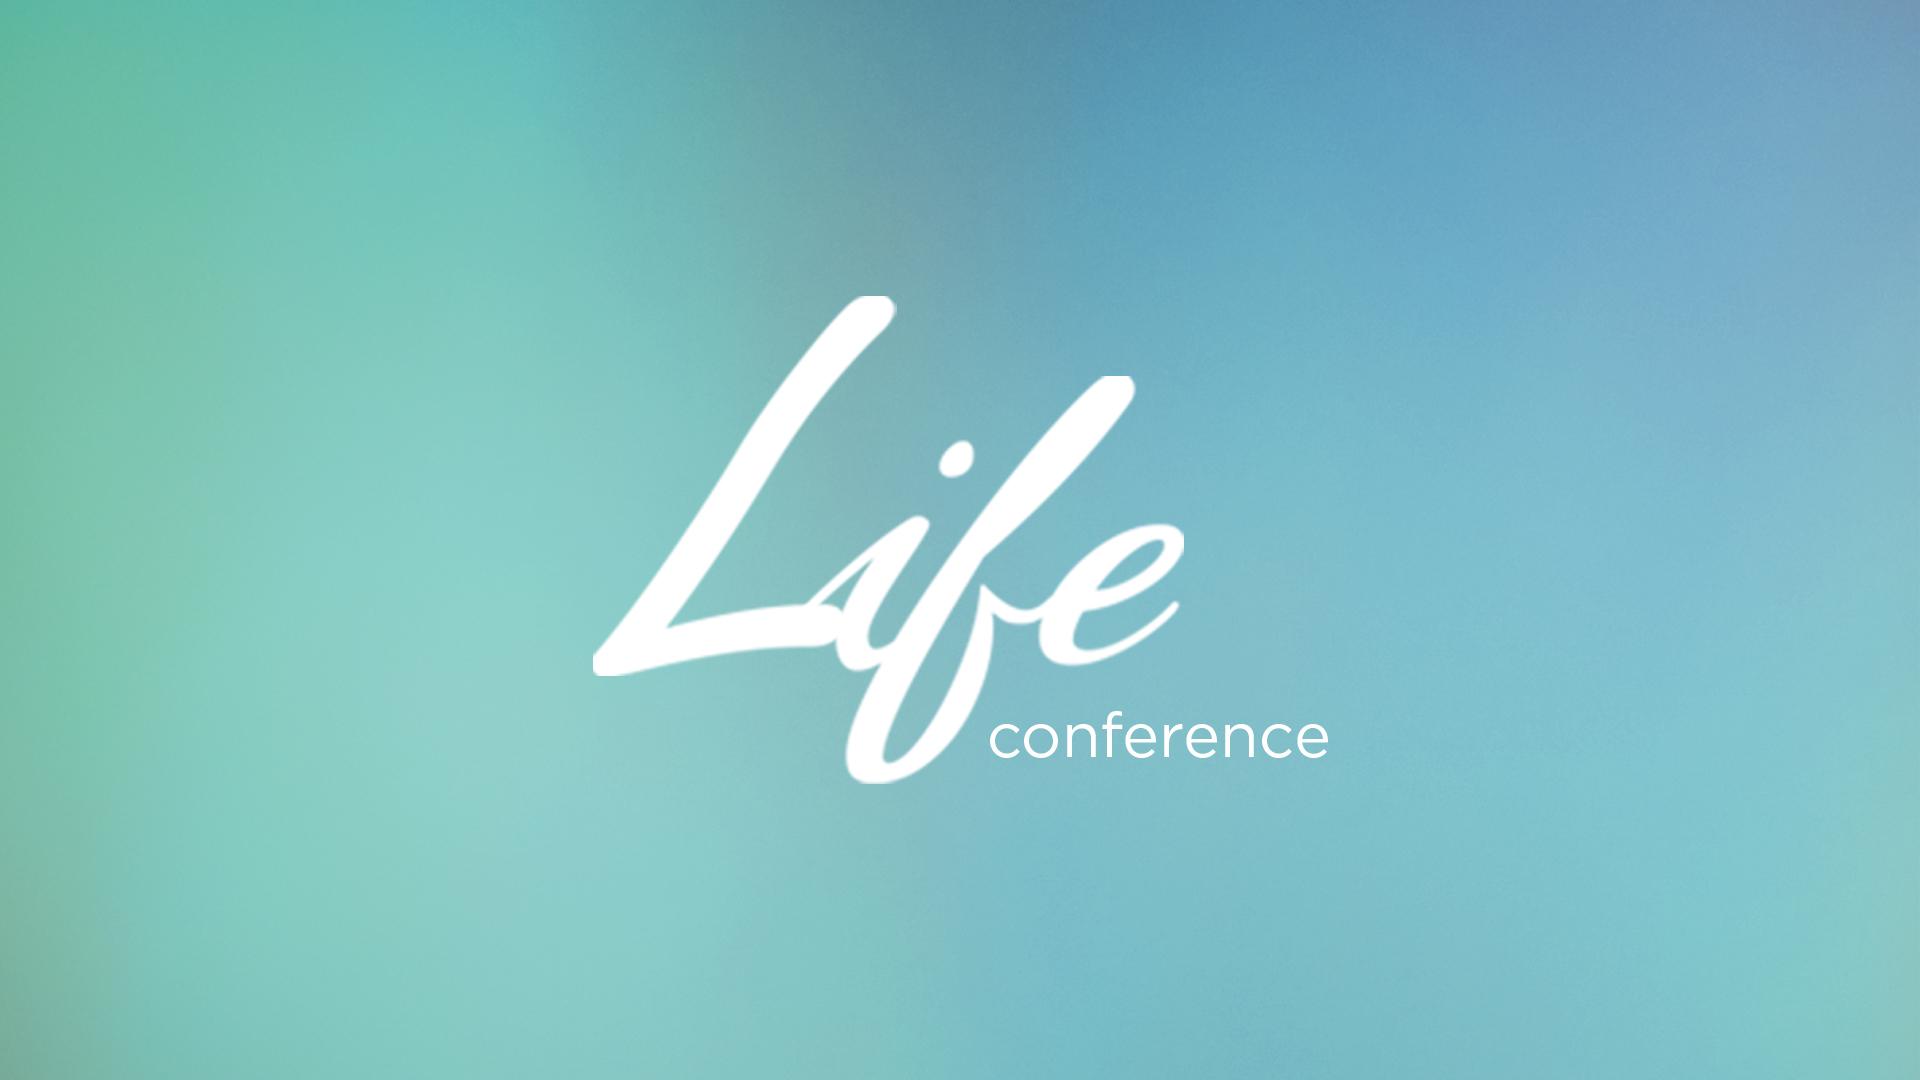 Life Conference Fall 2017 logo